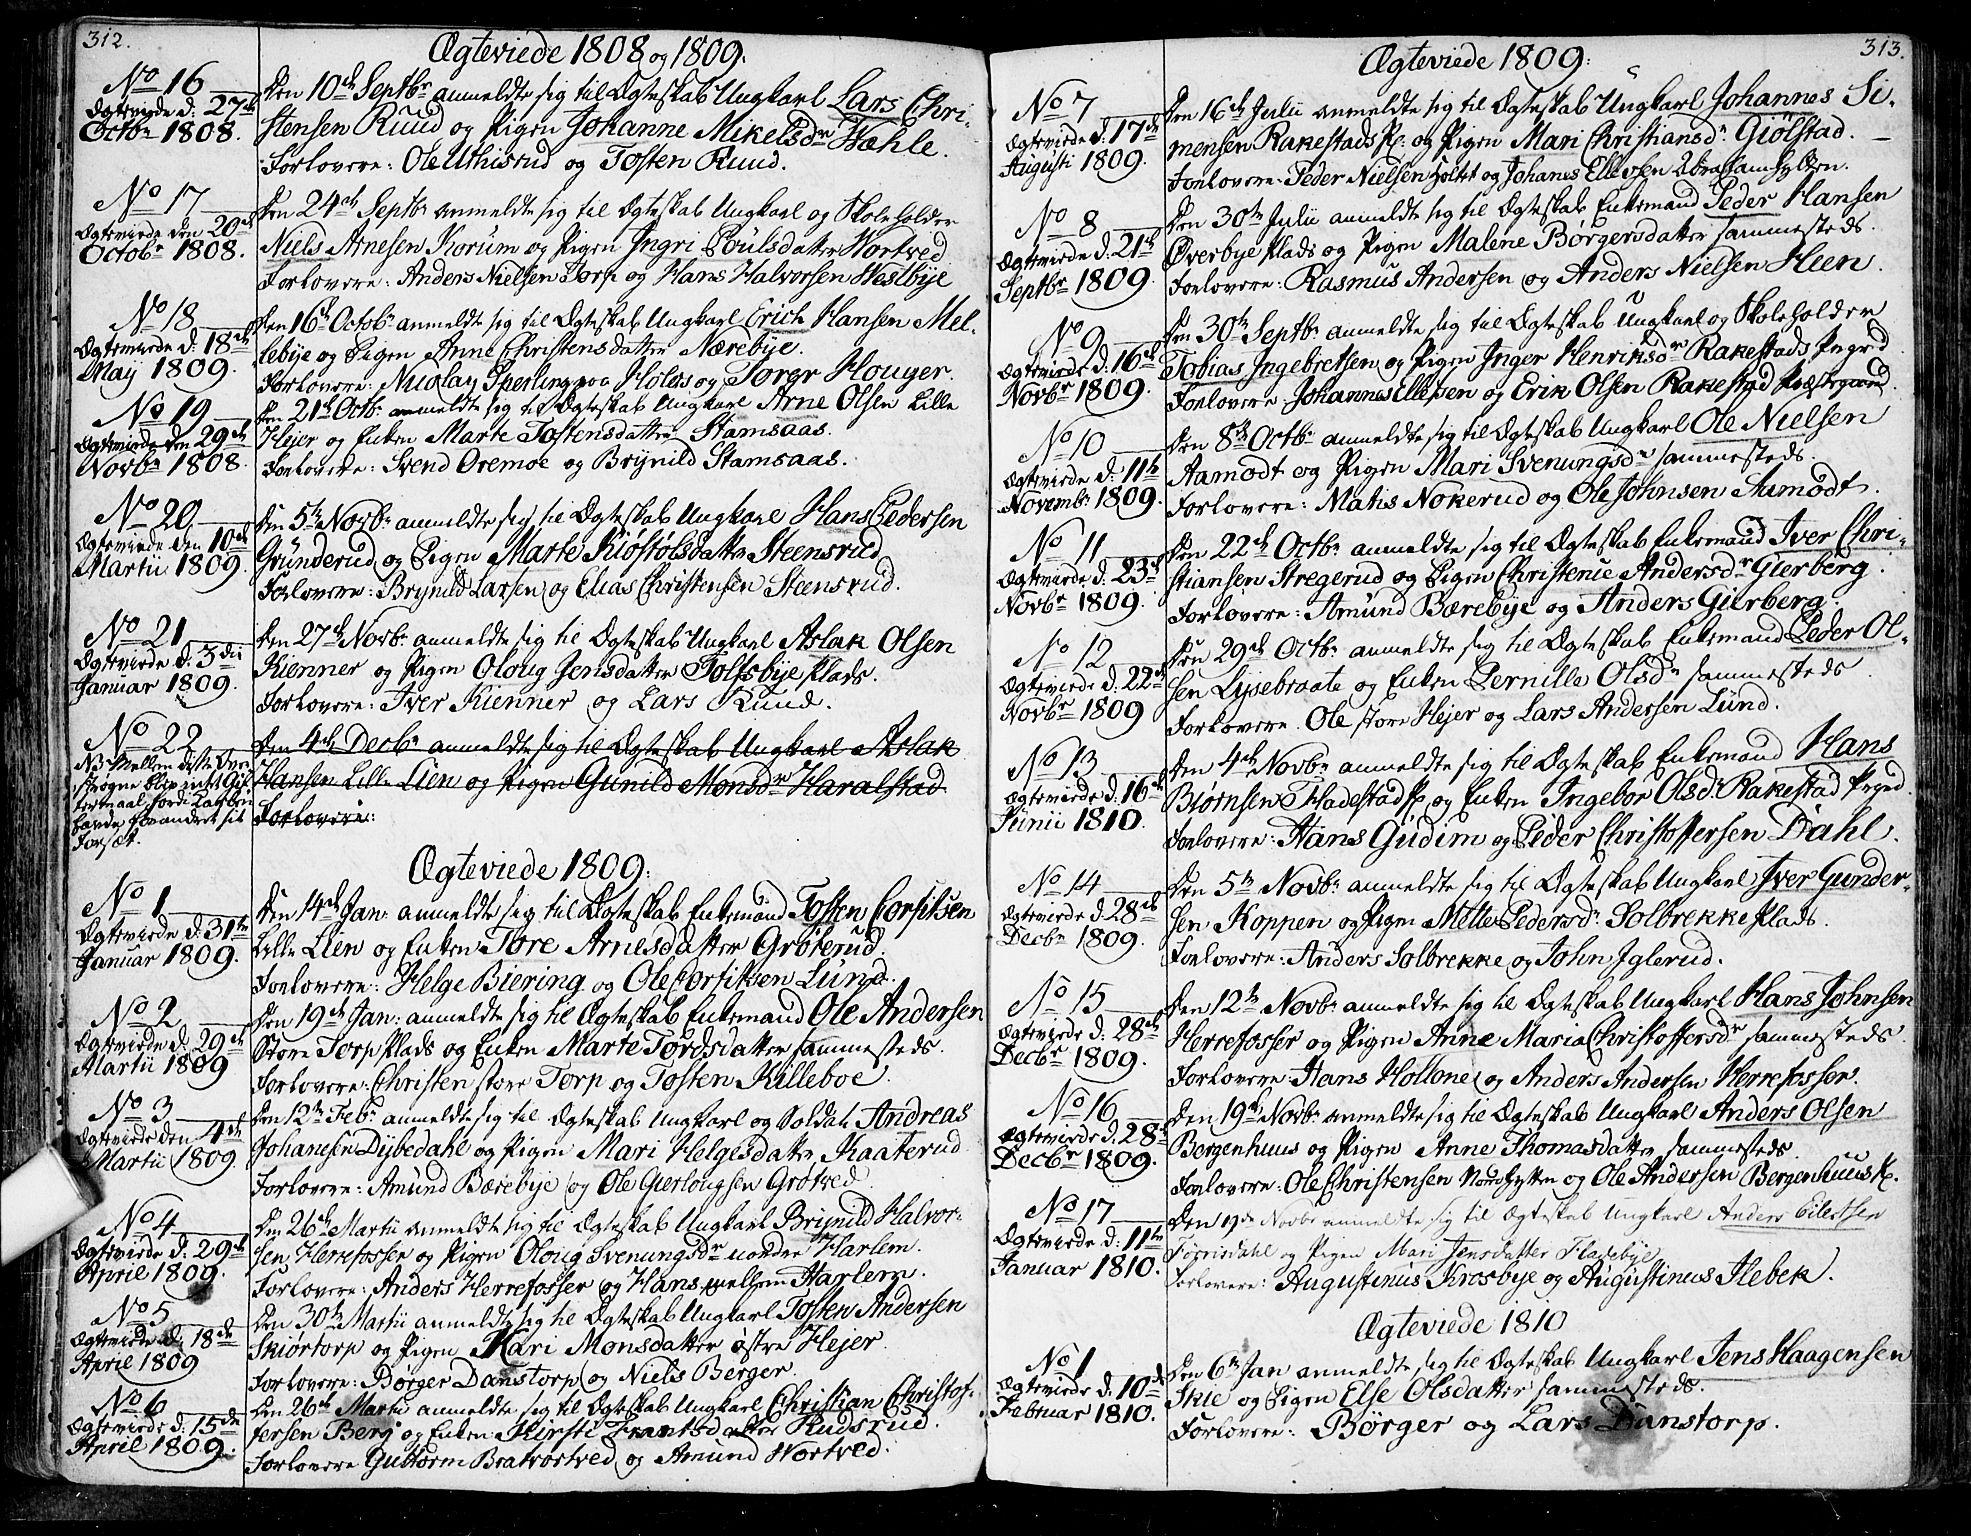 SAO, Rakkestad prestekontor Kirkebøker, F/Fa/L0005: Ministerialbok nr. I 5, 1784-1814, s. 312-313